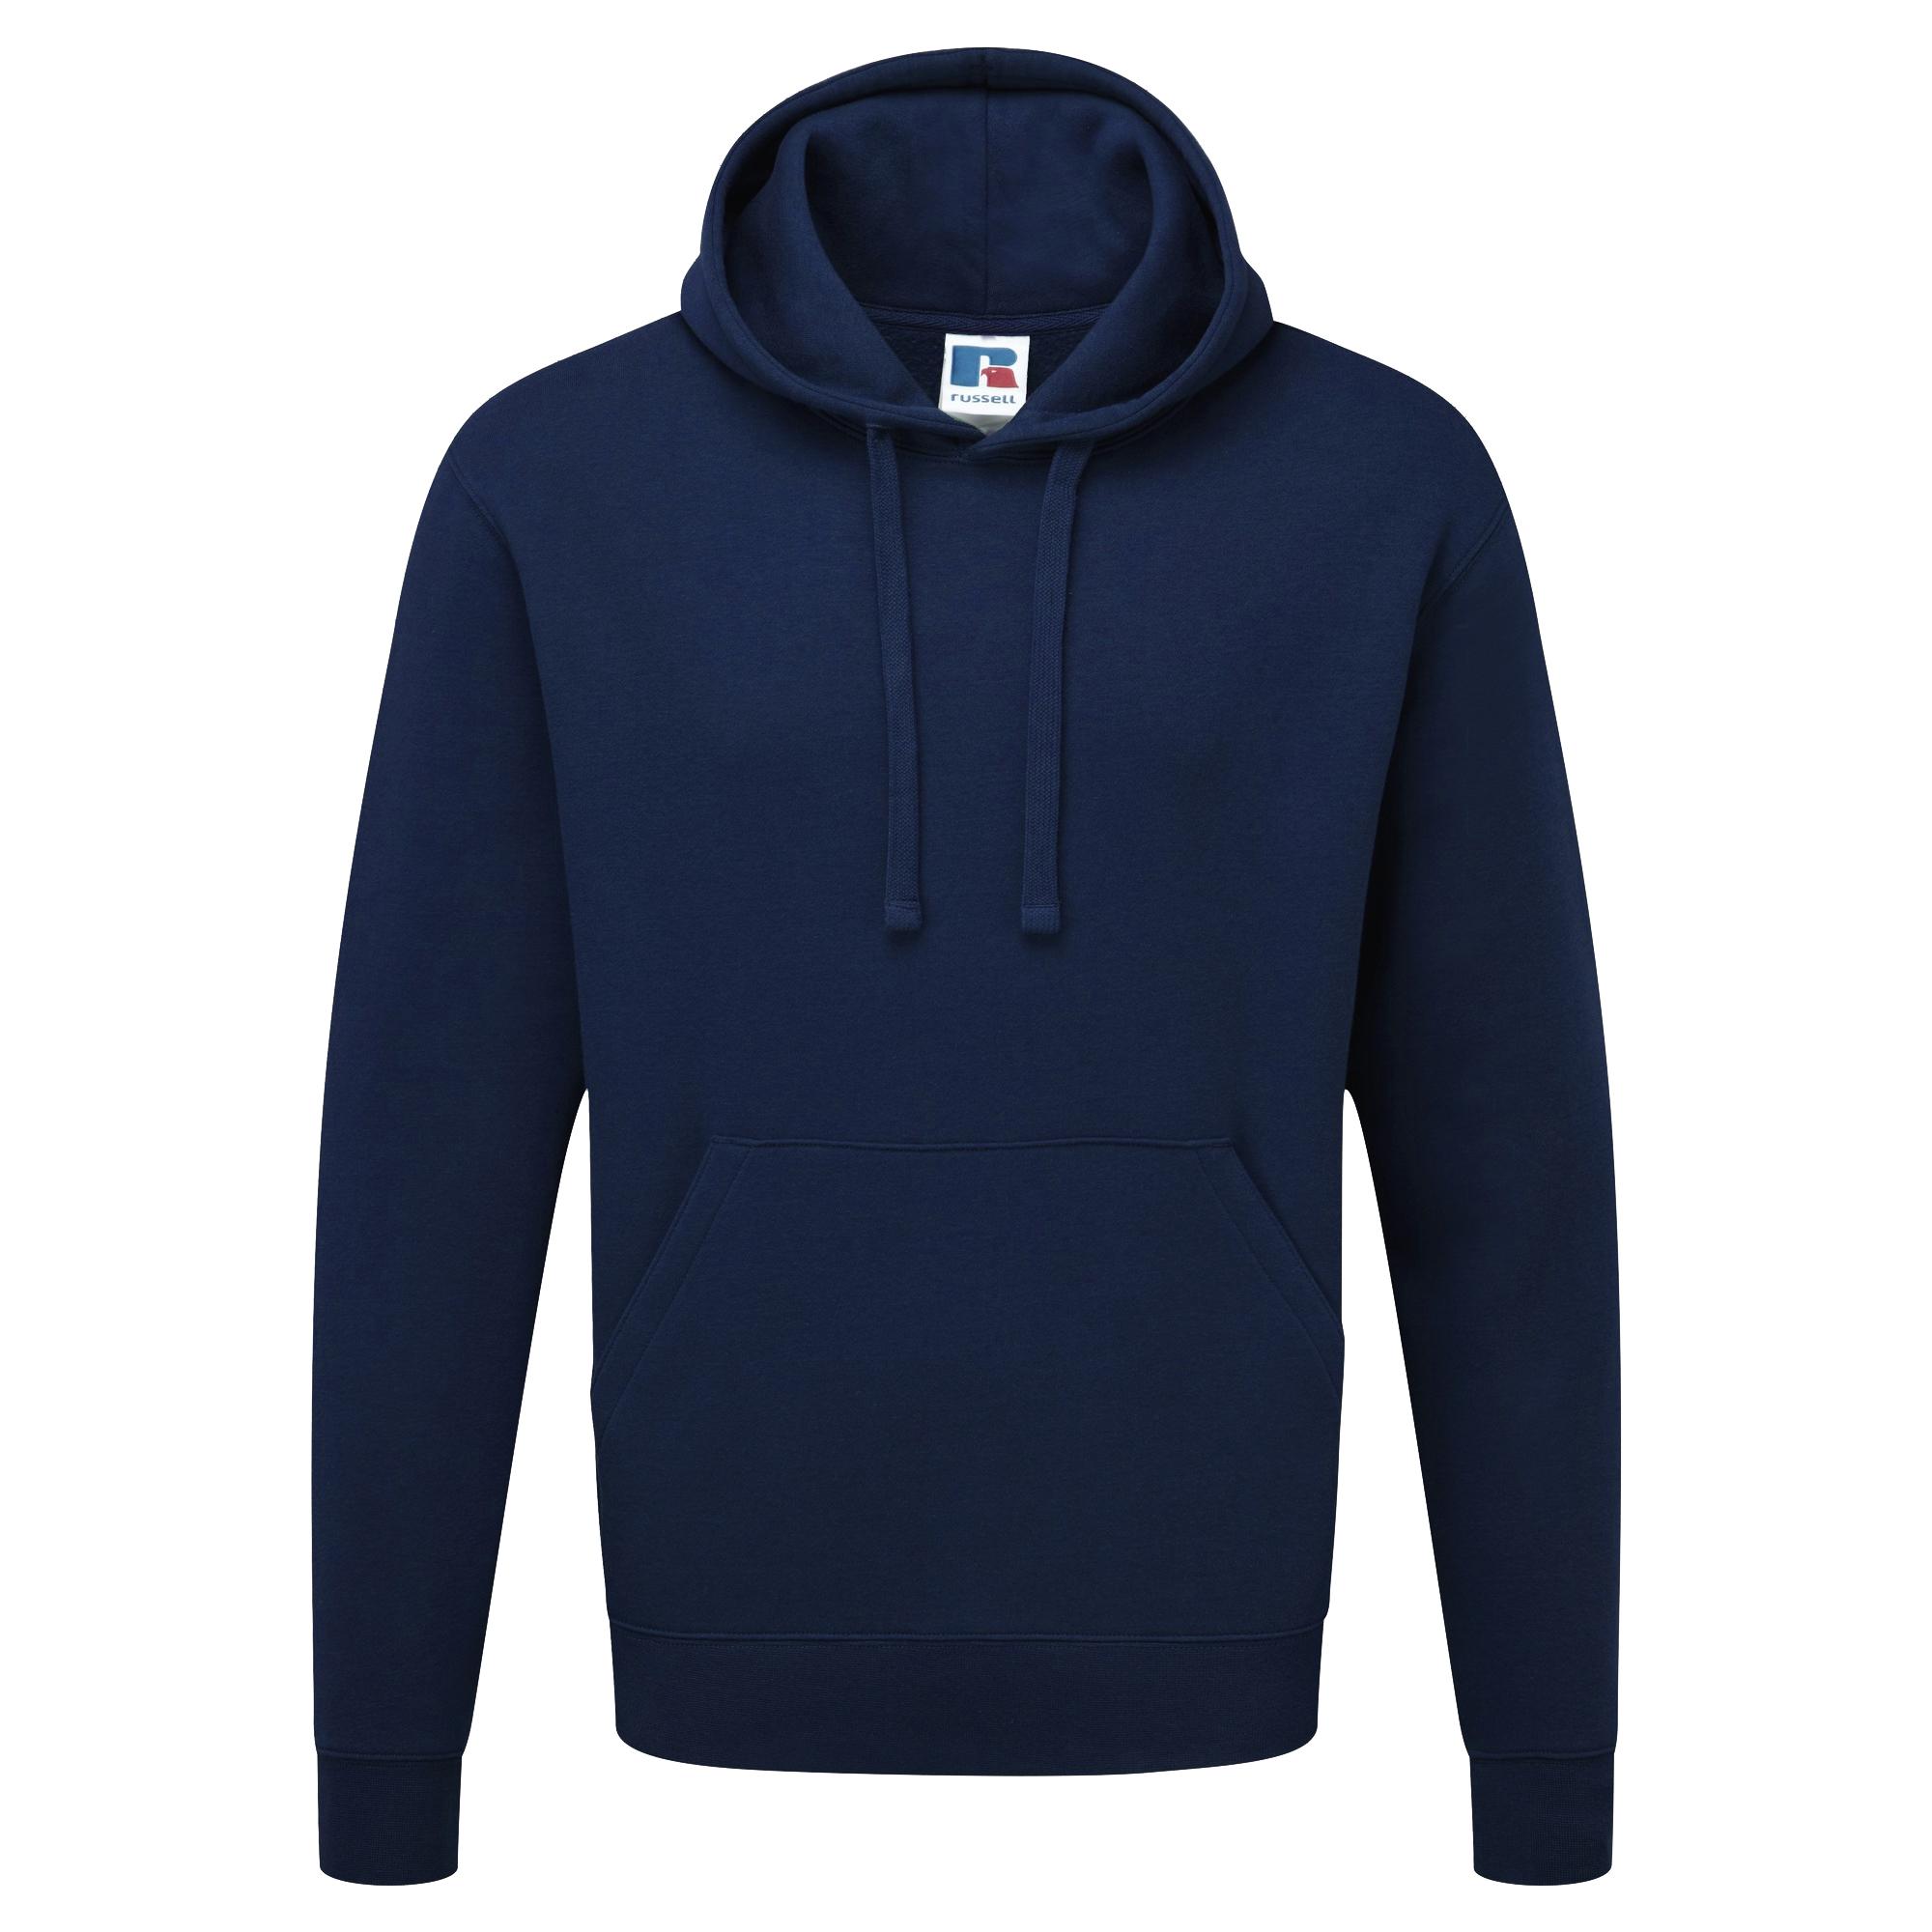 3xl hoodies